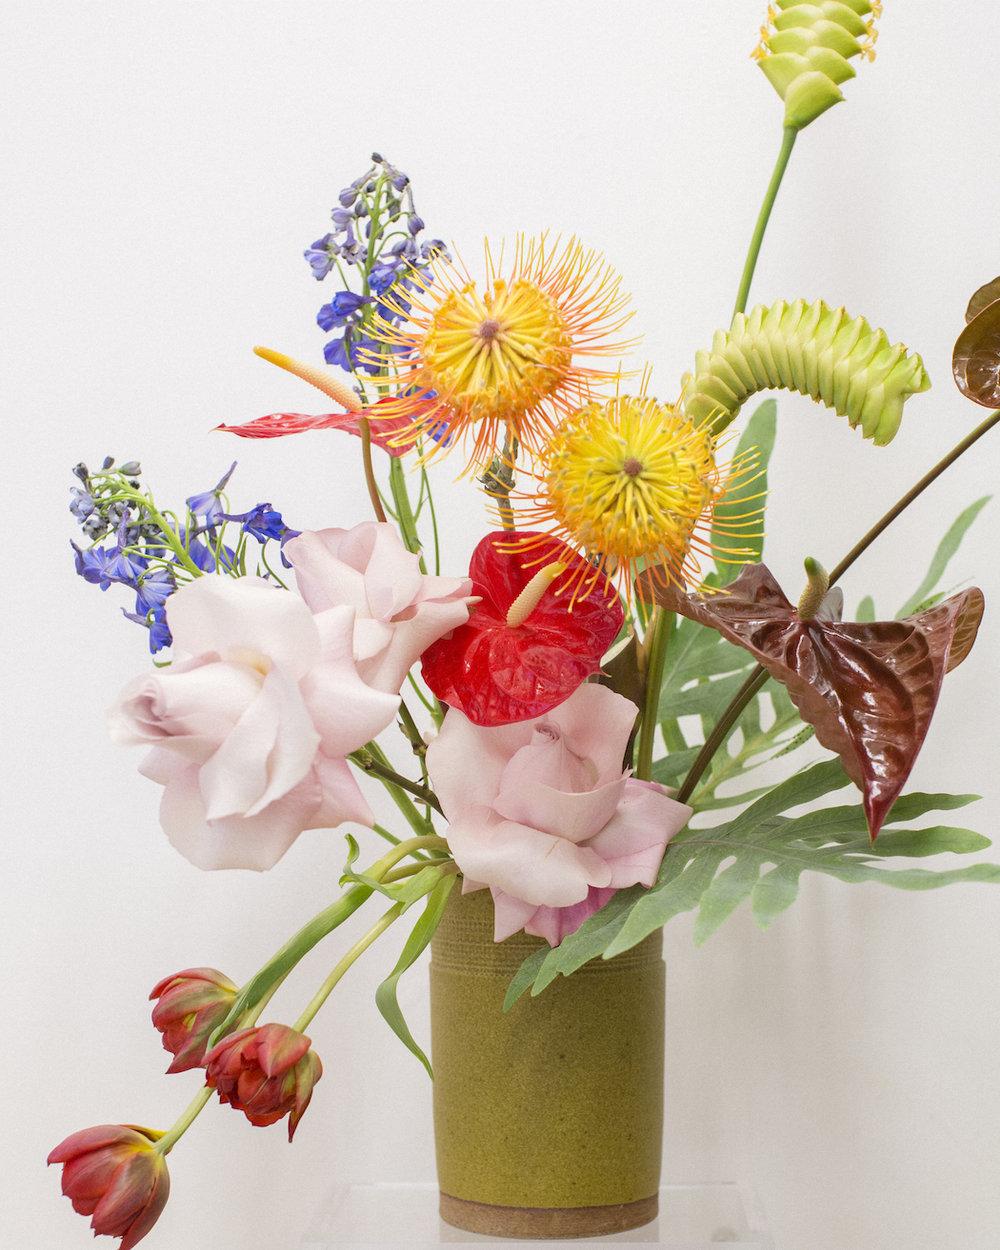 mei day colorful arrangement.jpg